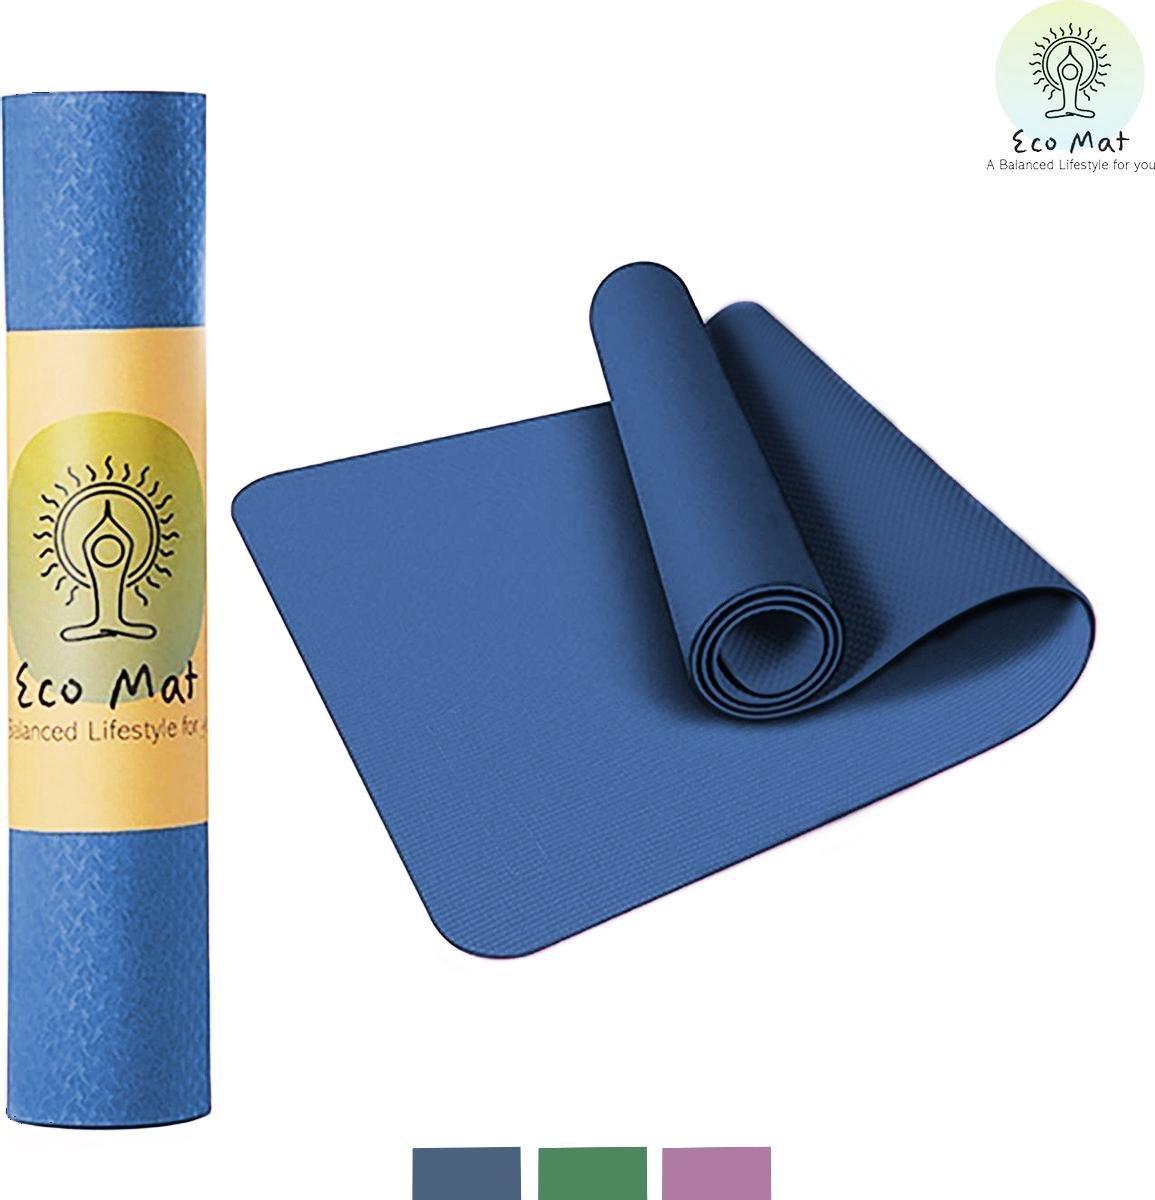 Eco Yoga Mat - Inclusief Draagriem - Anti Slip - Extra Dik (6 mm) - 61 x 183 x 0,6 cm - Donker Blauw